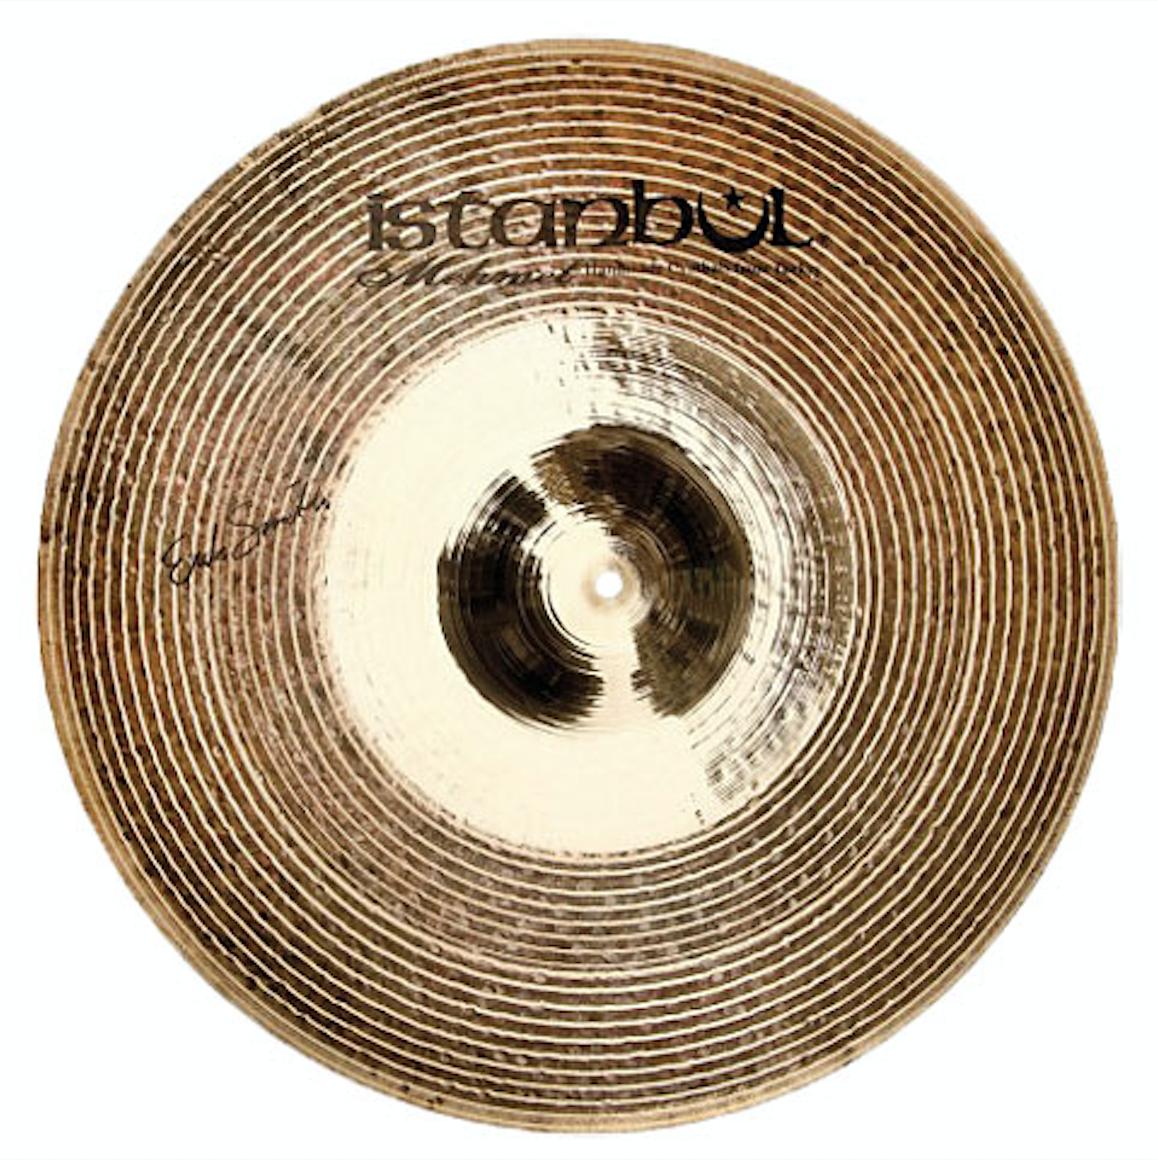 Istanbul Mehmet Cymbals · Erik Smith Versa 22  Ride Cymbal (2620g) w  DEMO VIDEO